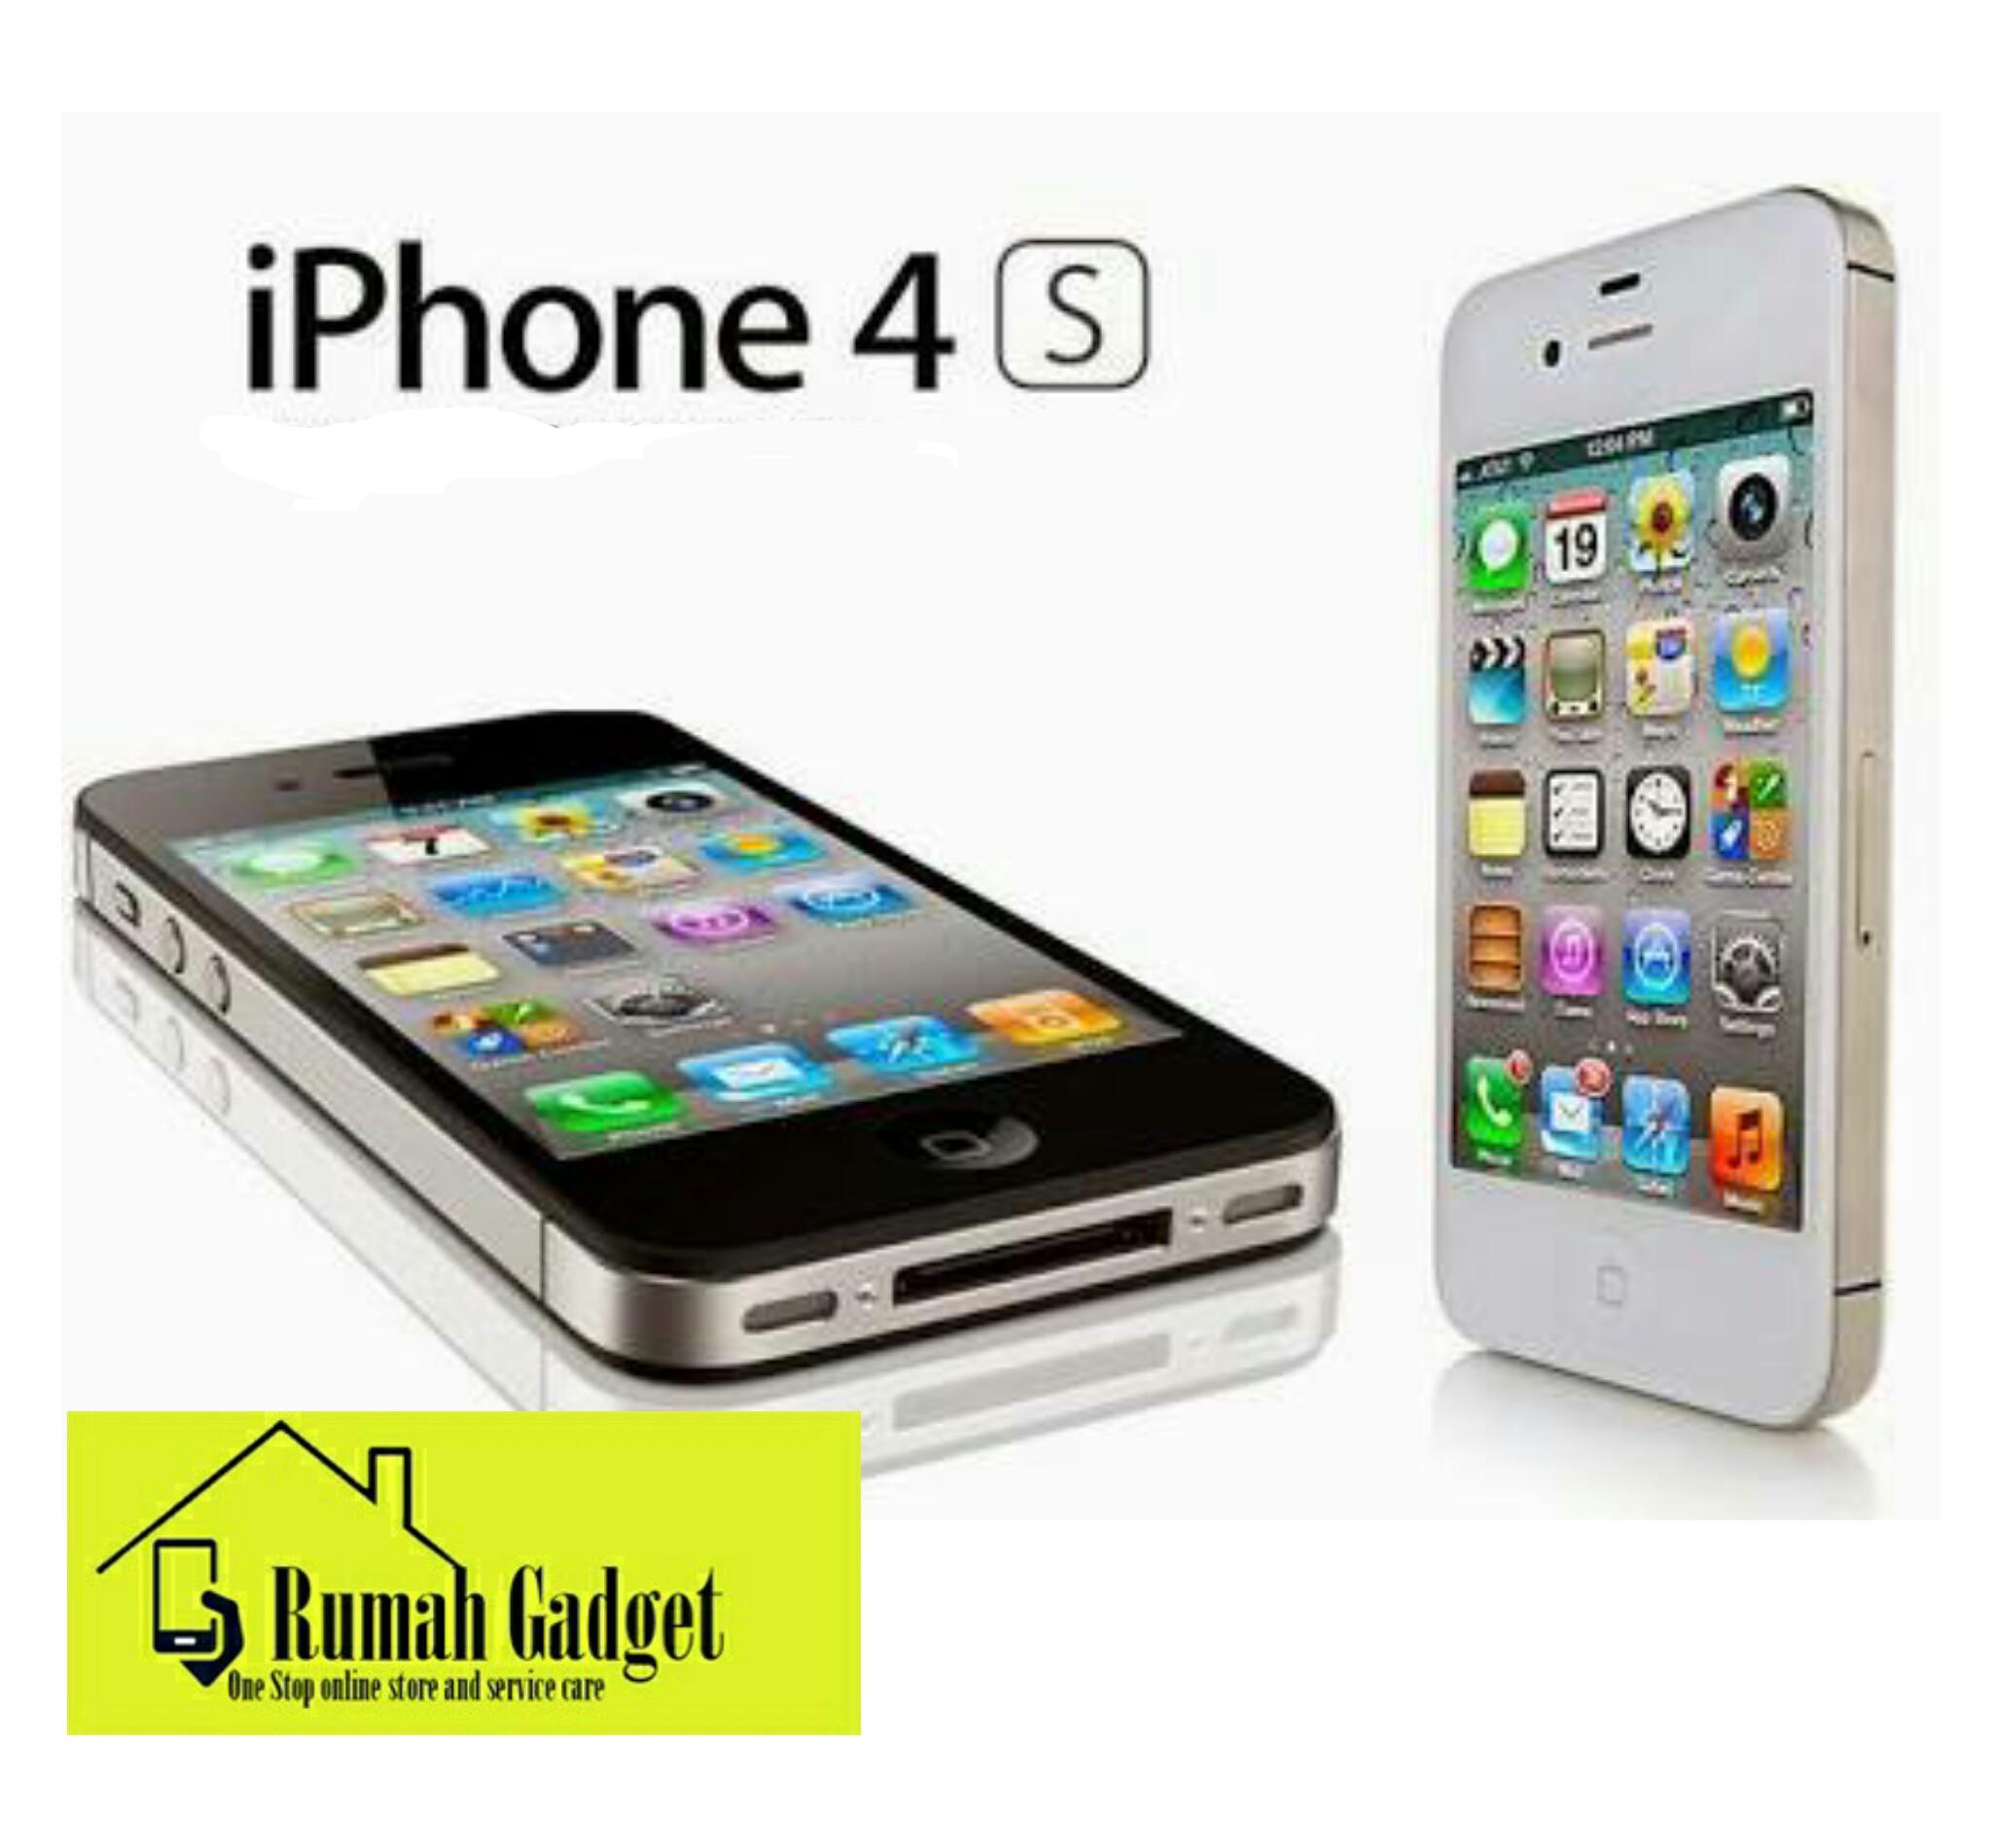 Jual Iphone 4s 32gb Black White Brand New In Box Garansi Platinum 1 Years gad geex